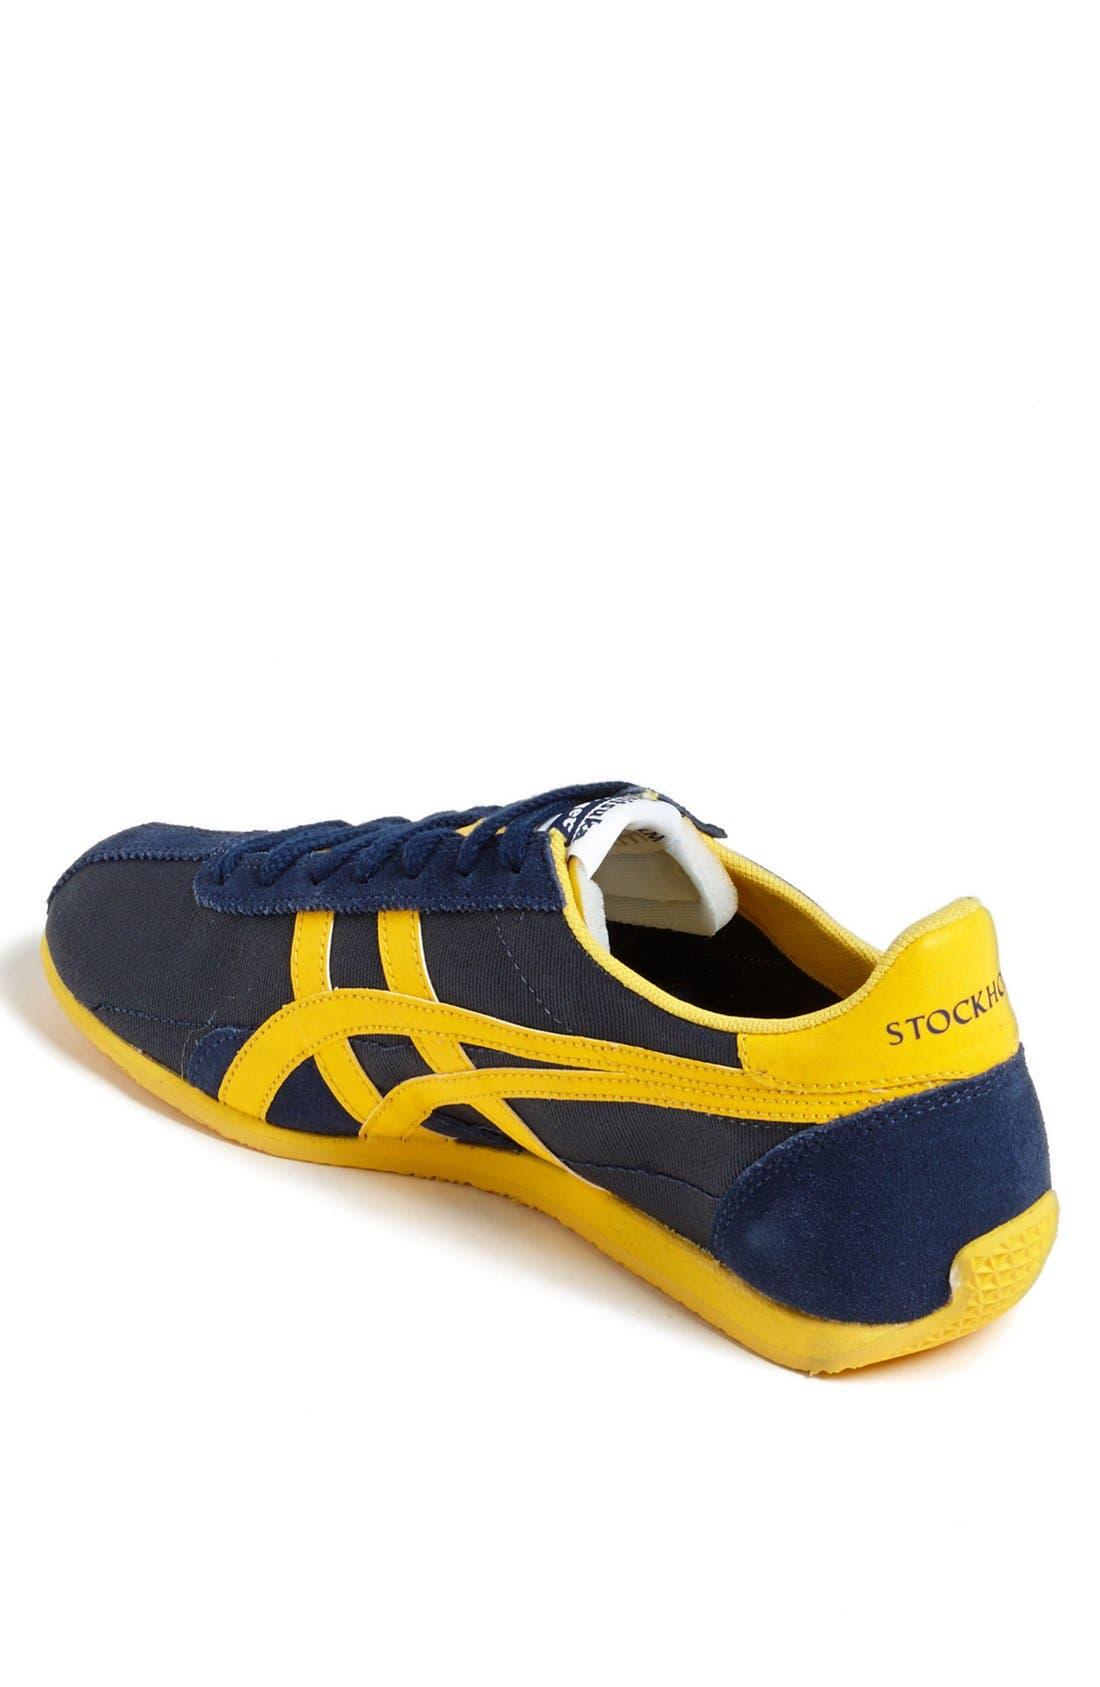 Alternate Image 2  - Onitsuka Tiger™ 'Runspark' Sneaker (Men)